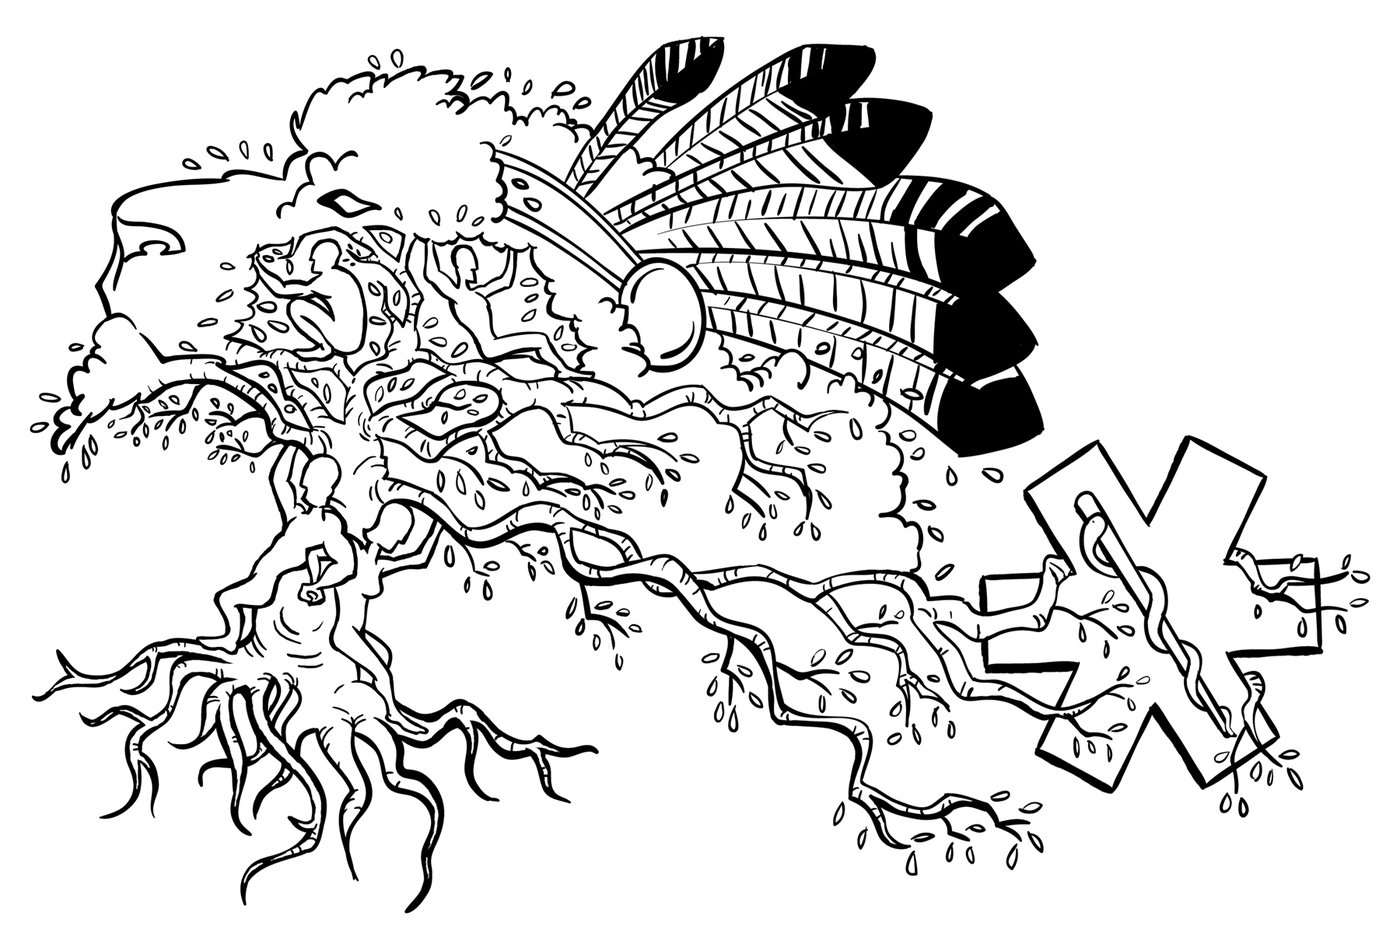 Tattoos by Jonathan Hughes at Coroflot.com